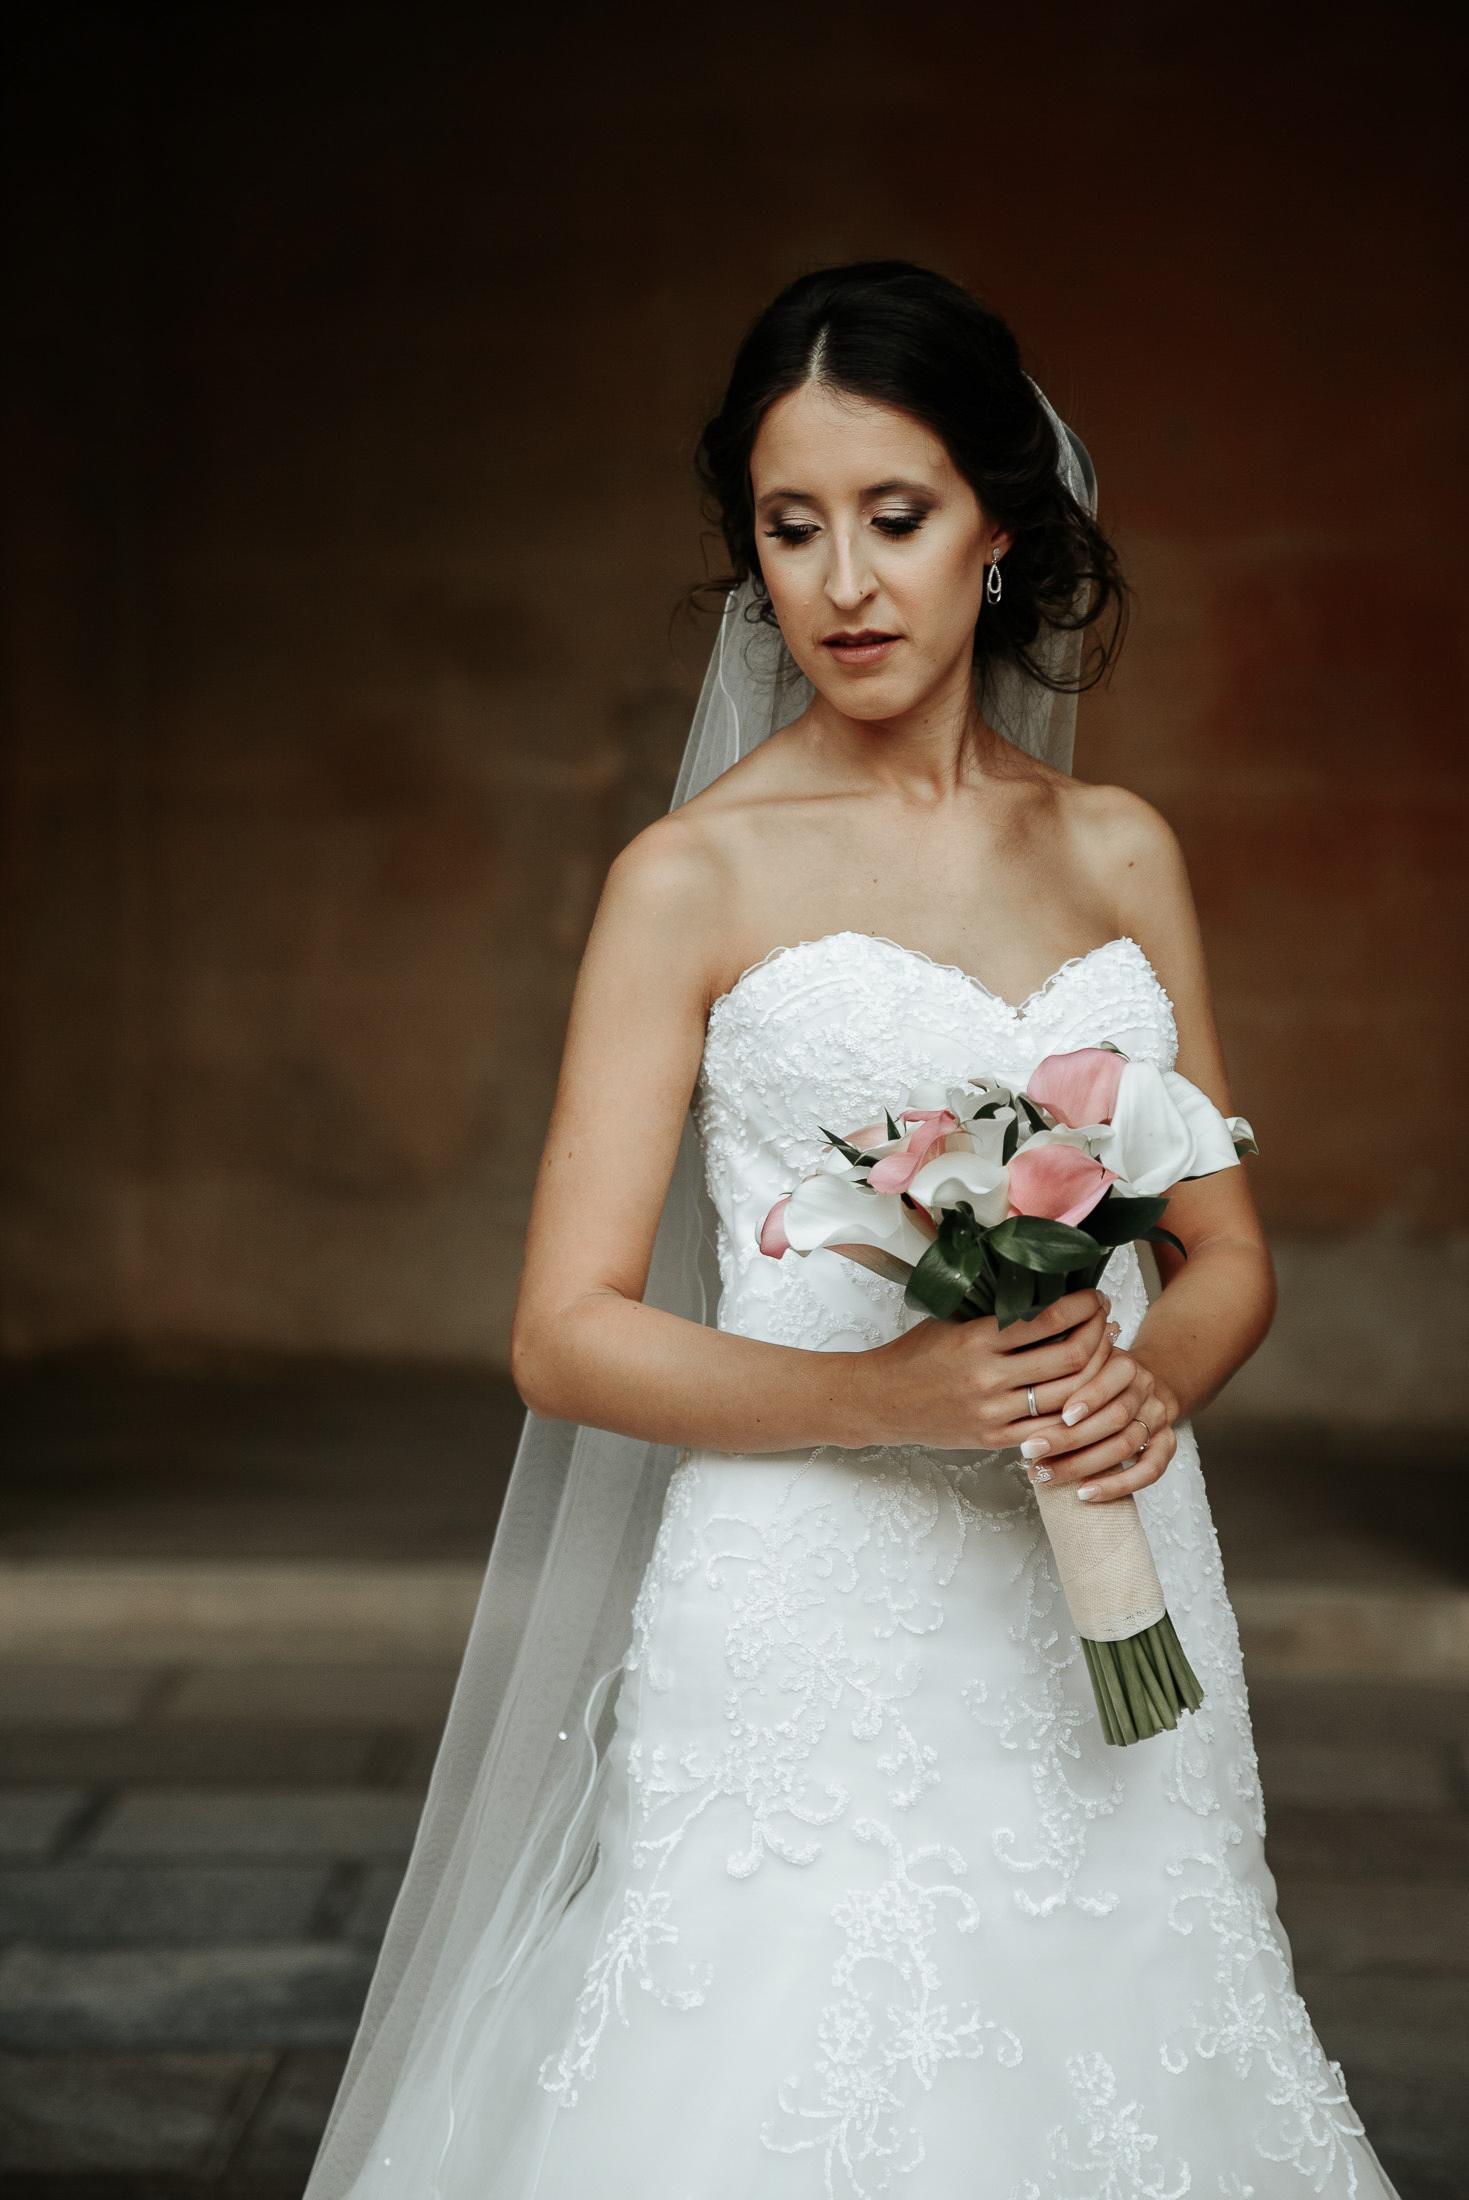 Wedding in Alhambra - Bride